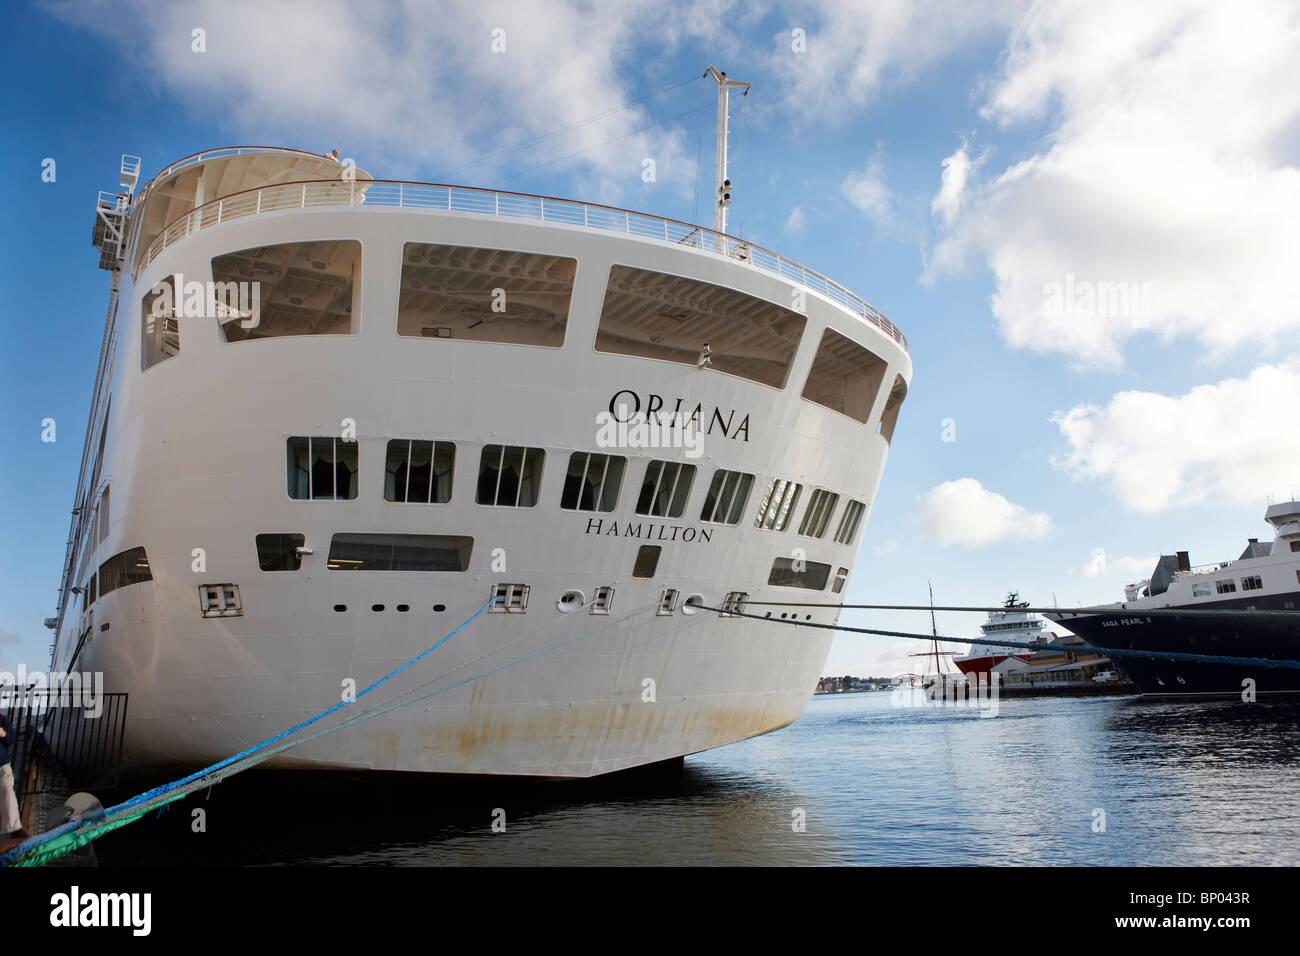 P O Cruises Cruise Liner Oriana Stock Photo Royalty Free Image - P and o cruises ships